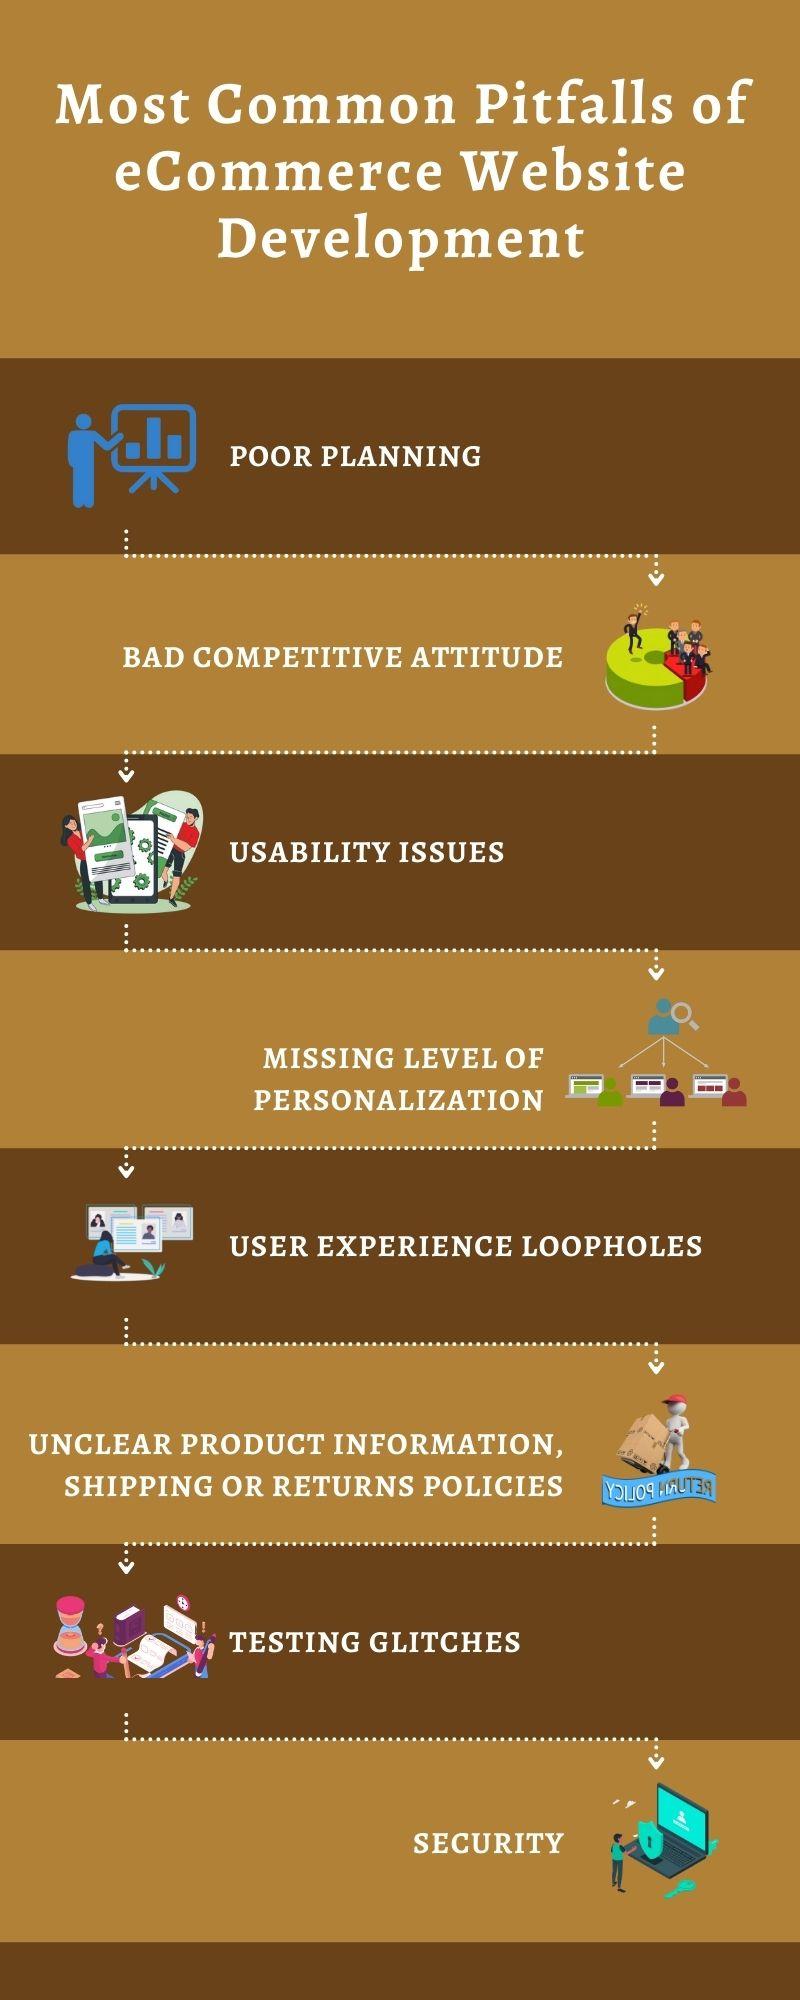 Most Common Pitfalls of eCommerce Website-Development